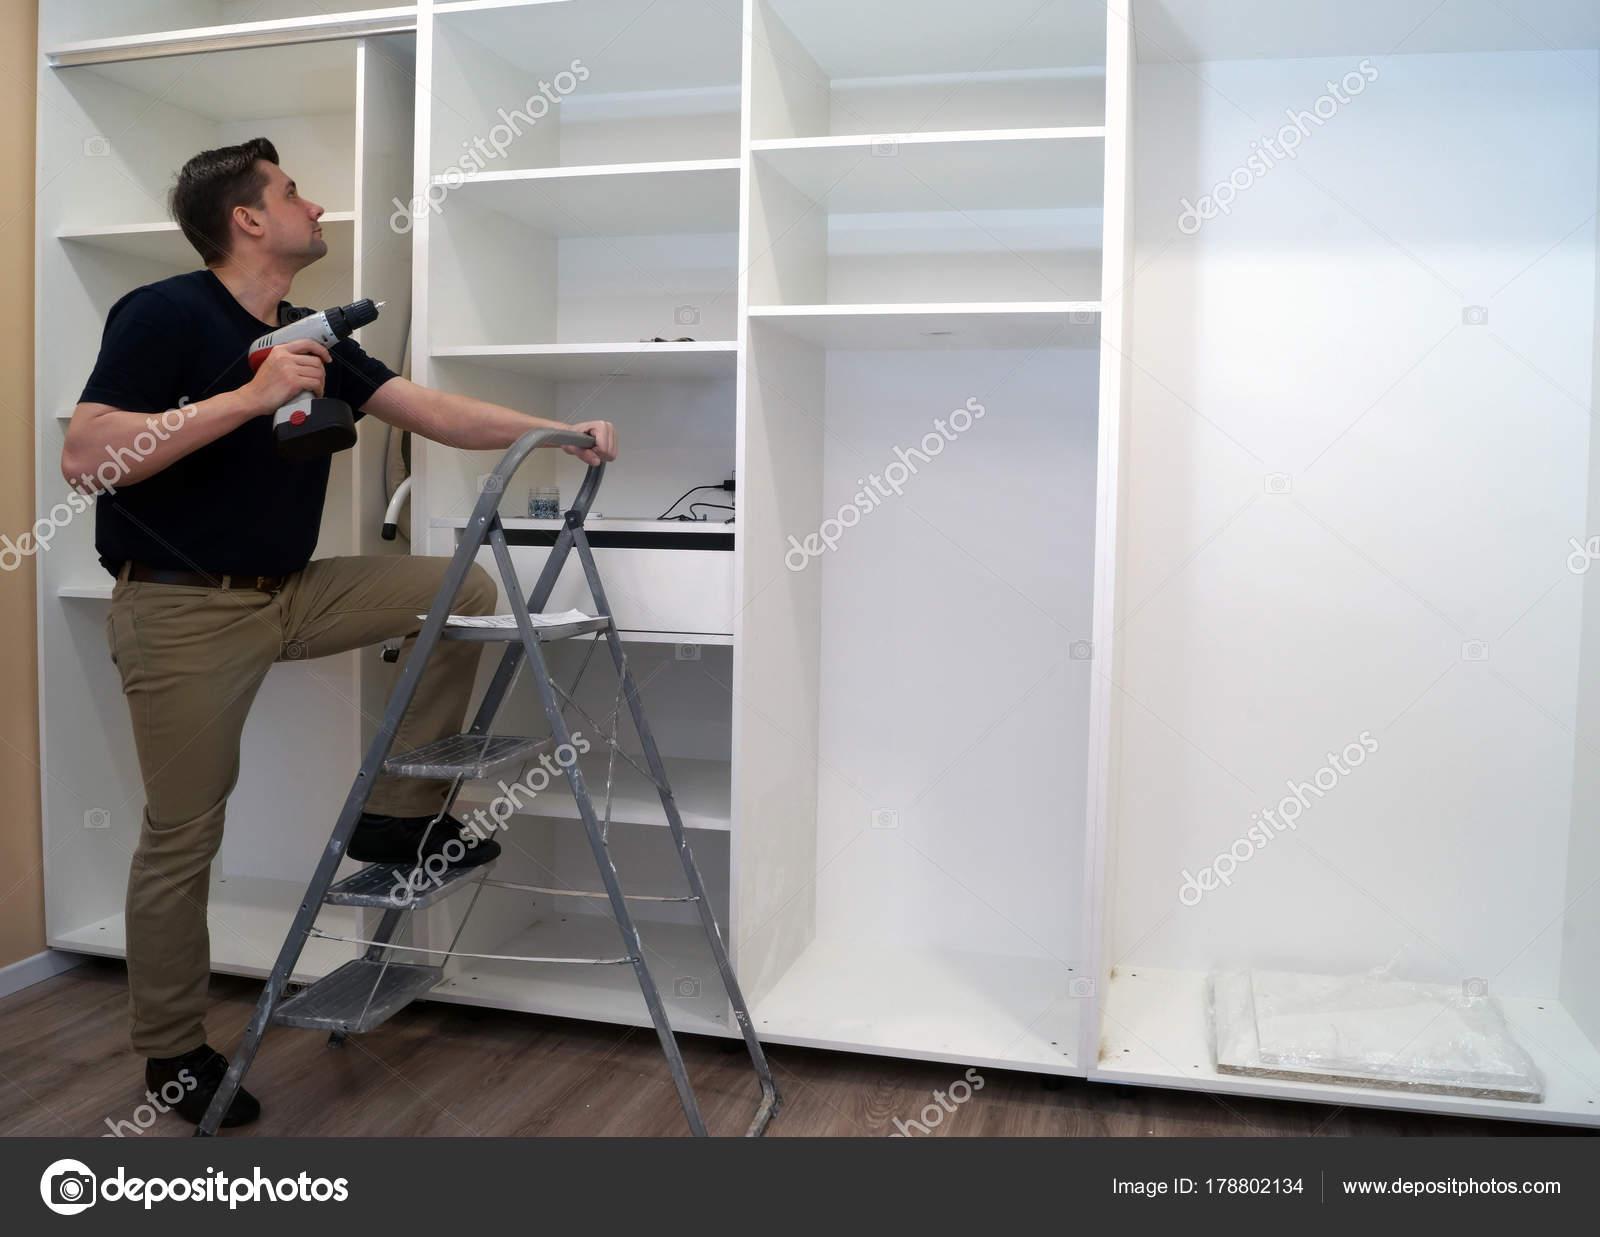 Grote Slaapkamer Kast : Installatie van grote slaapkamer kast u stockfoto designer